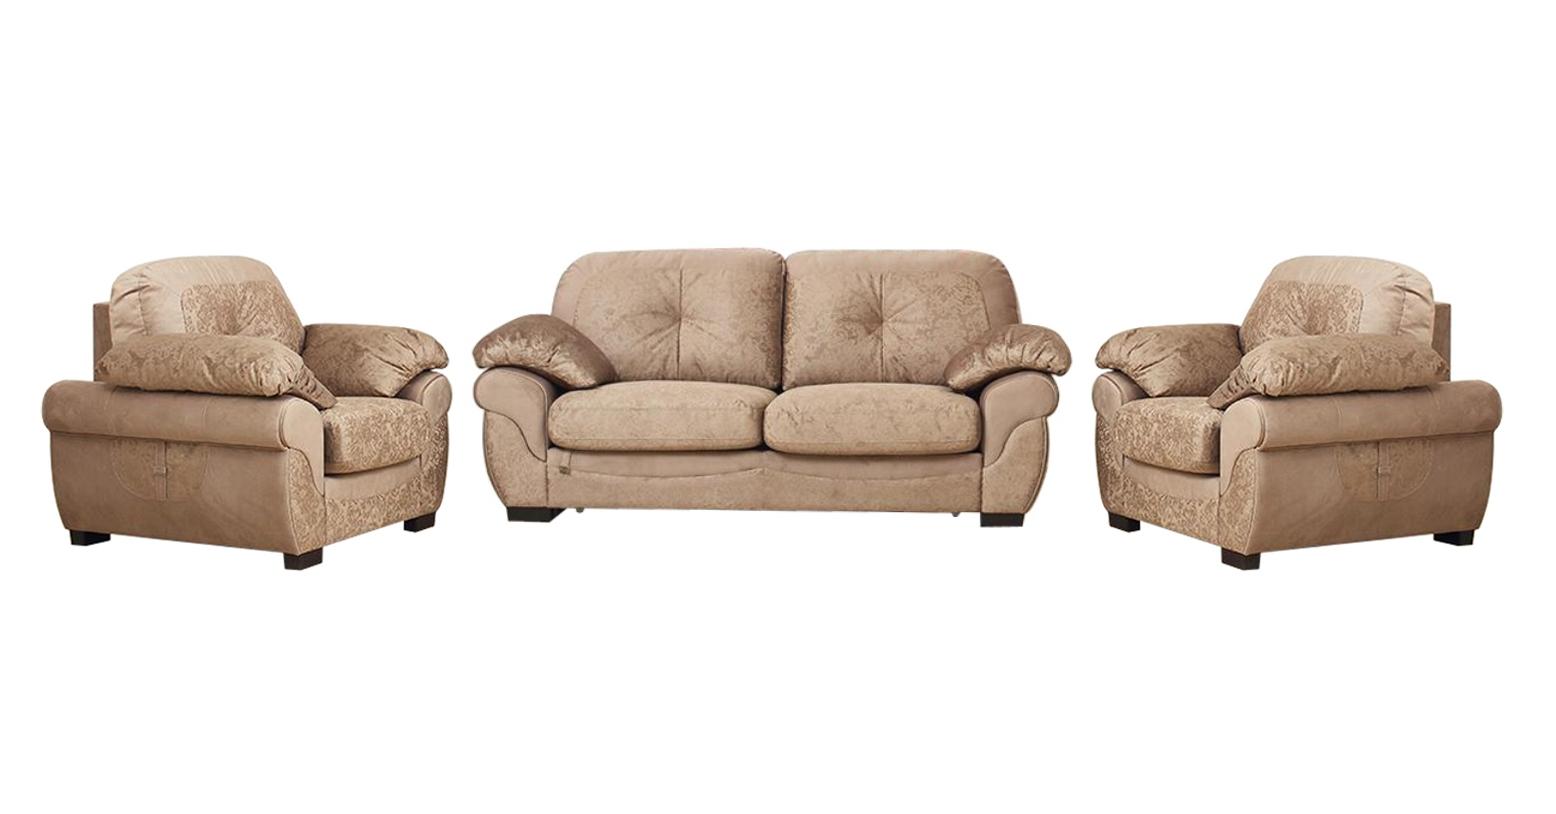 Комплект мягкой мебели Дион